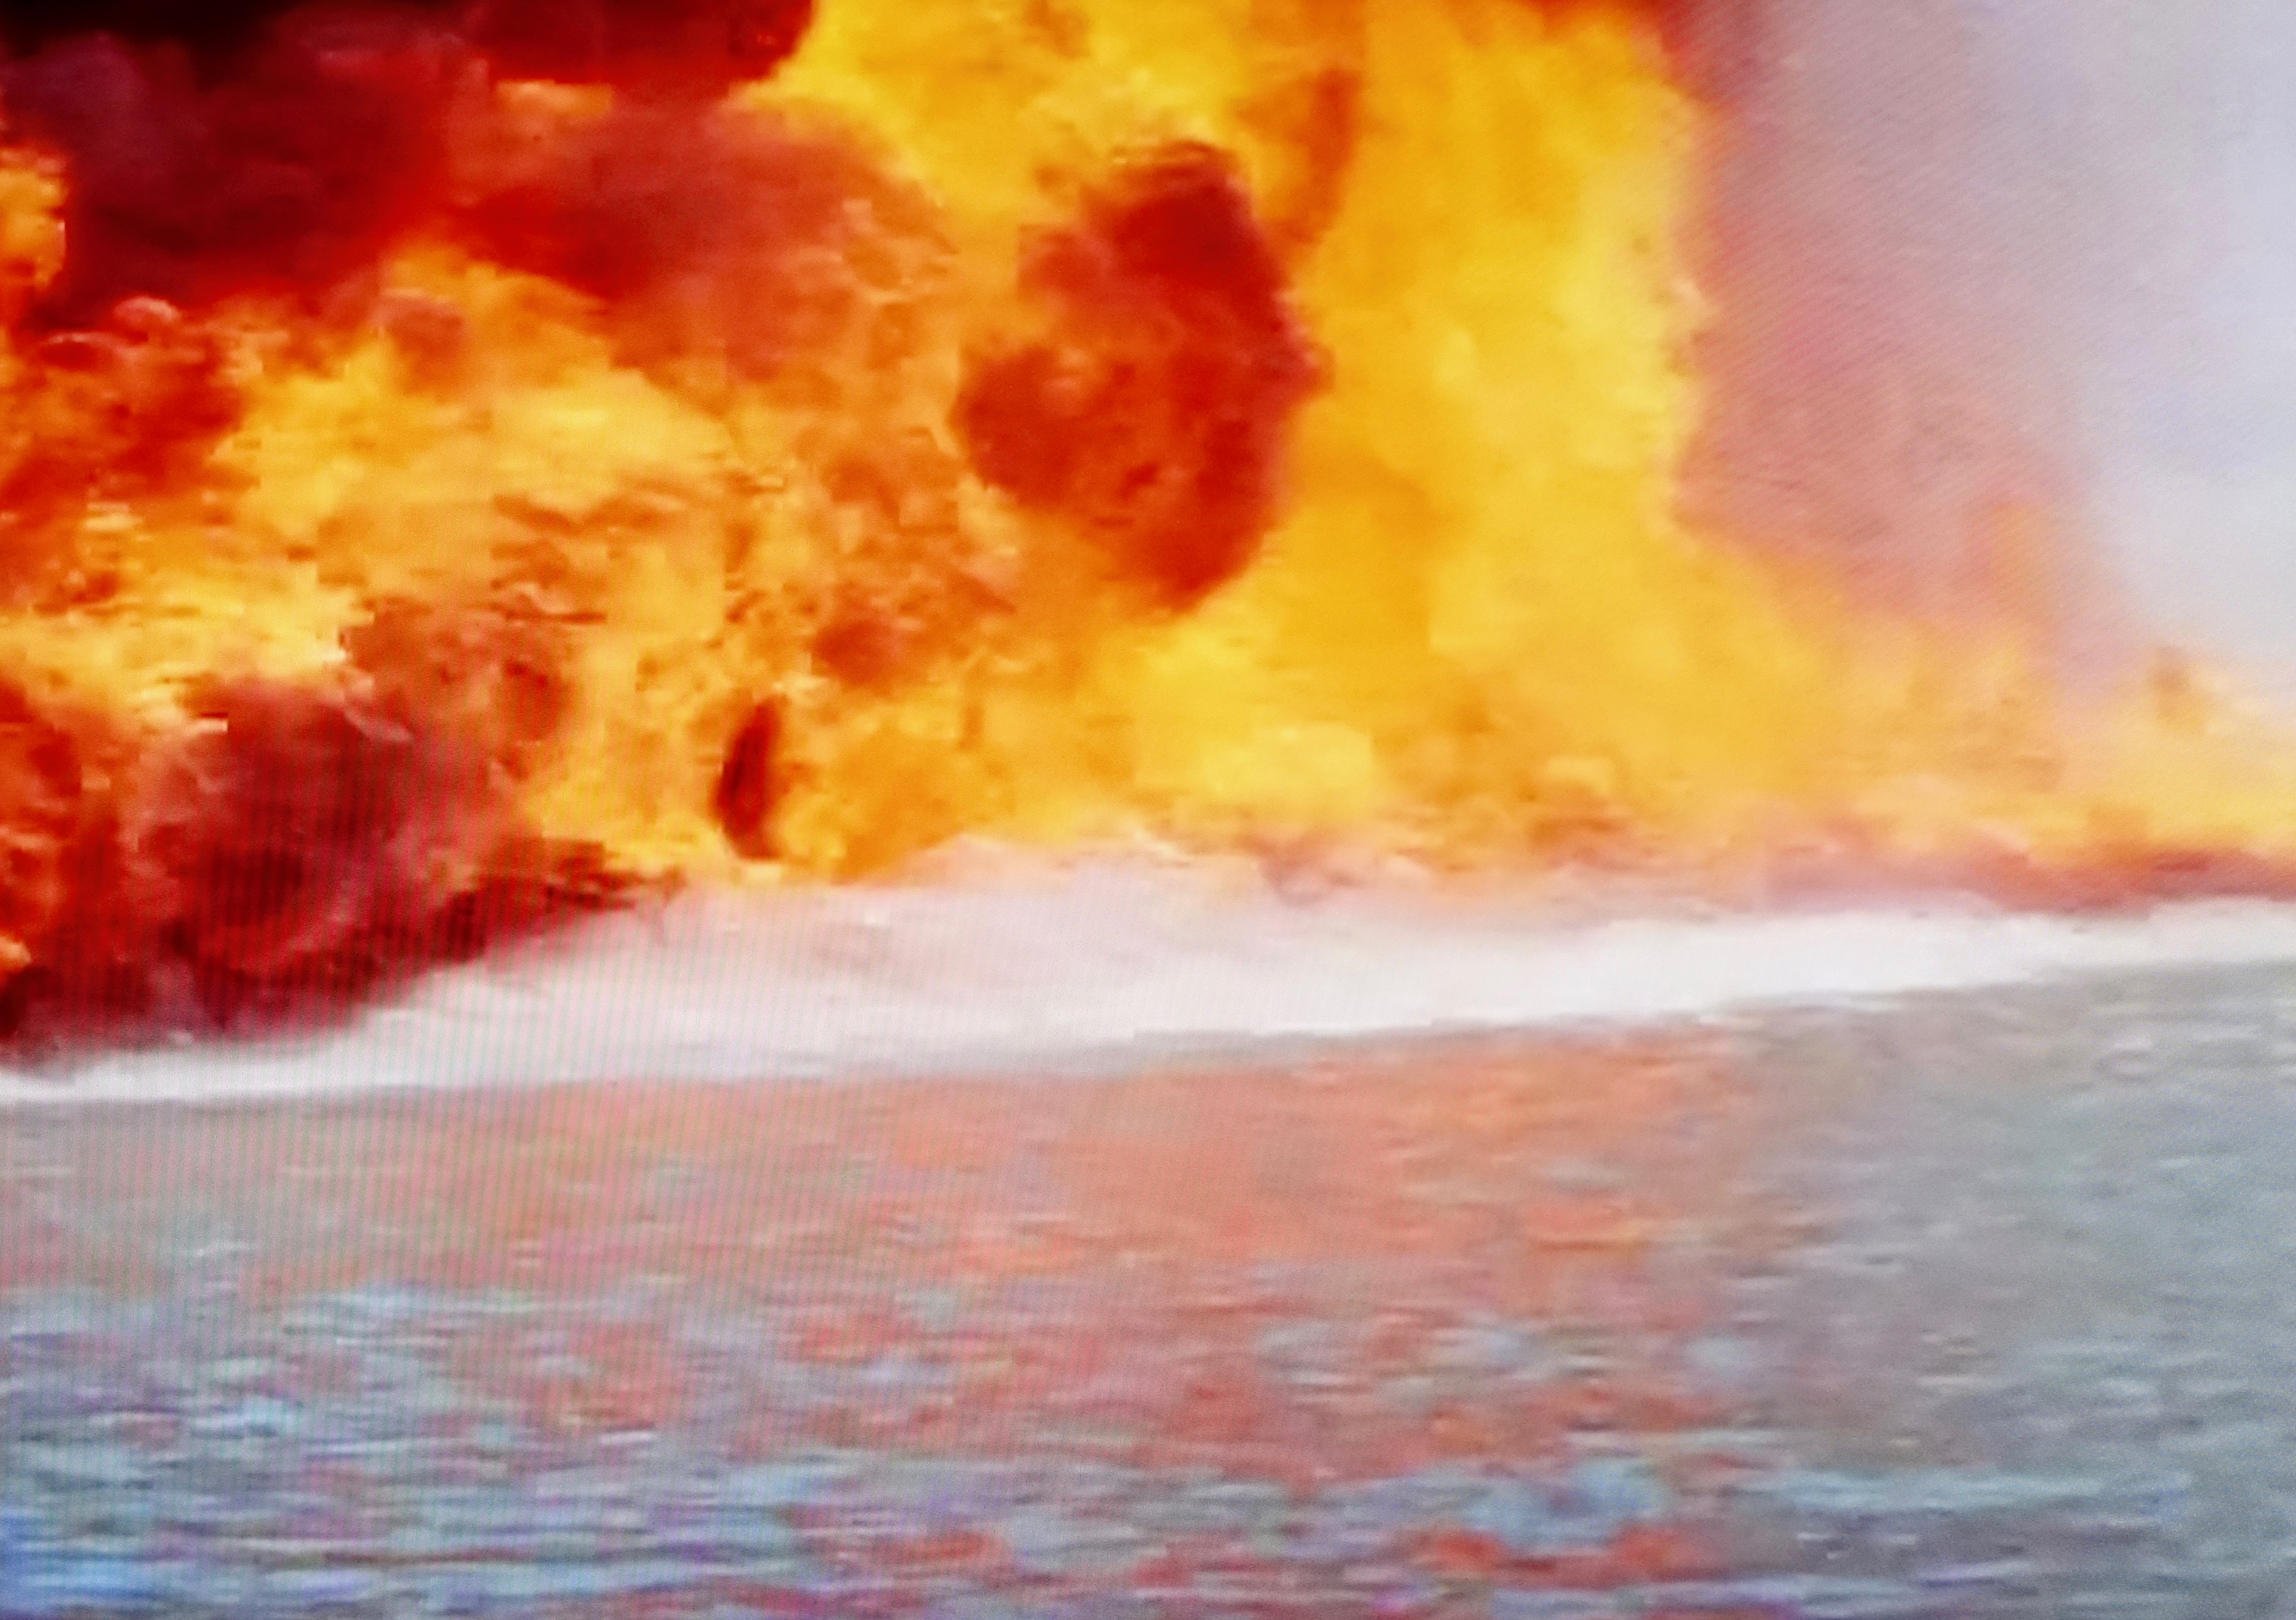 explosions-abound-in-condorman